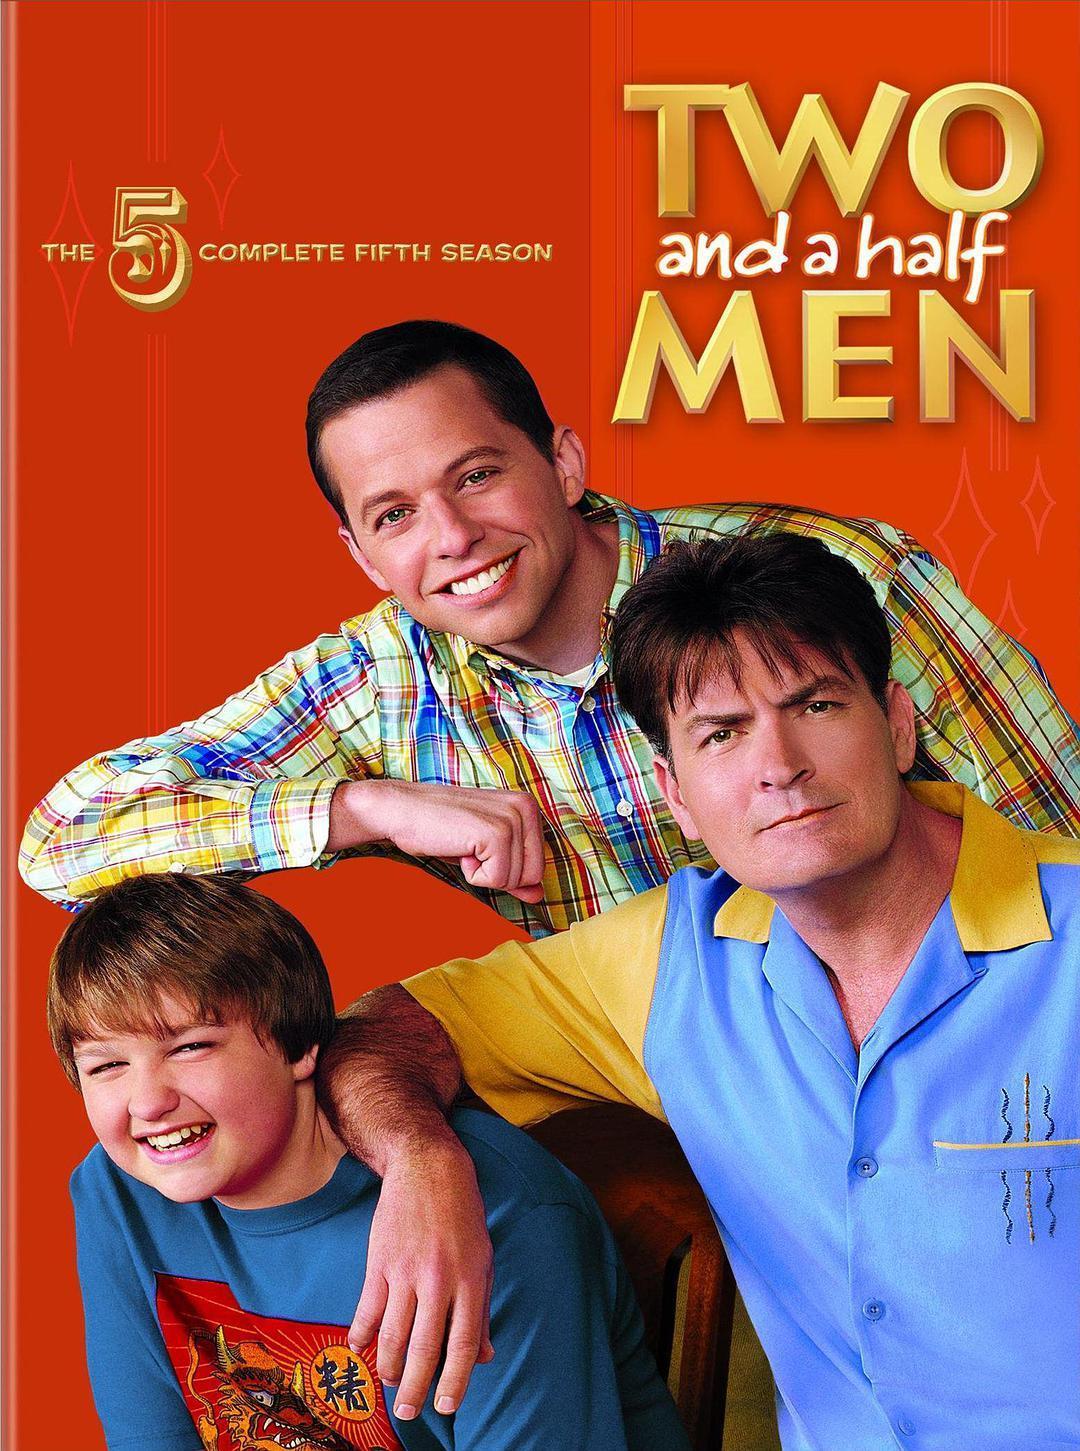 Two and a Half Men Season 5